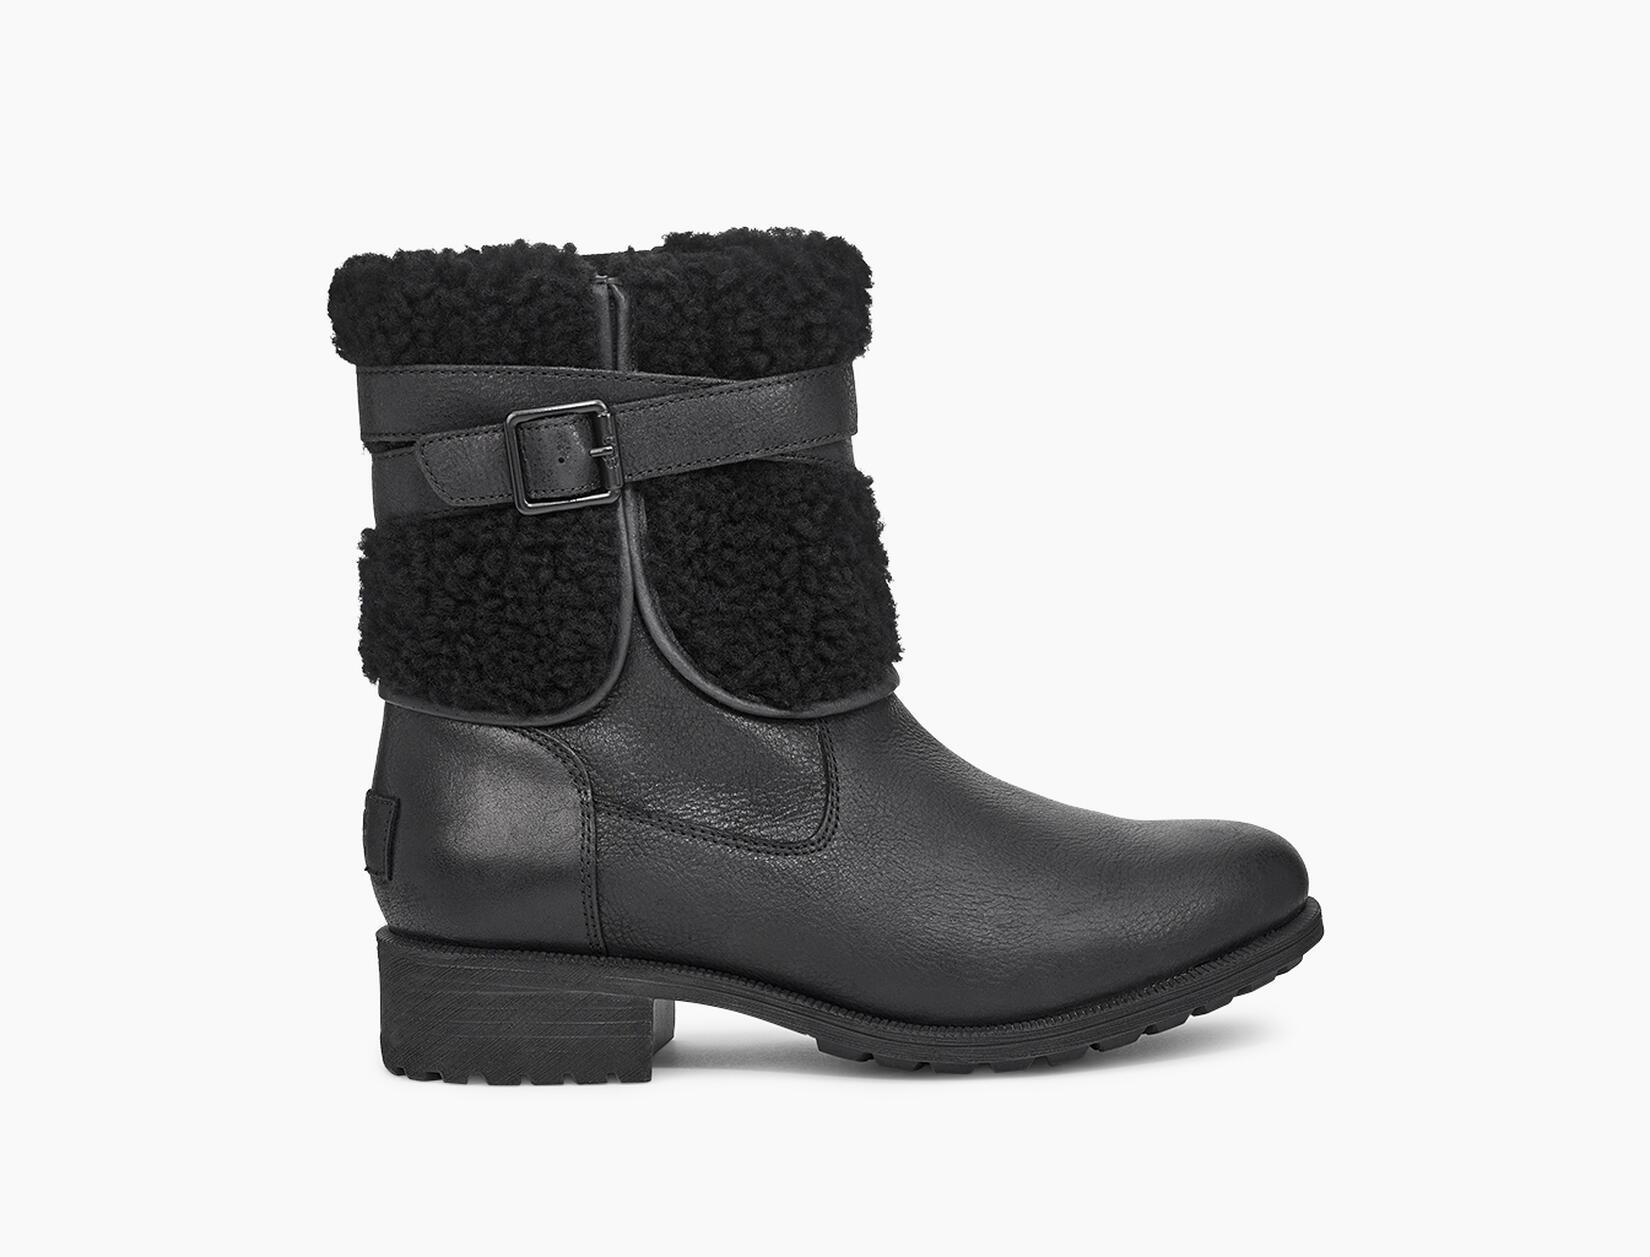 Blayre IV Boot